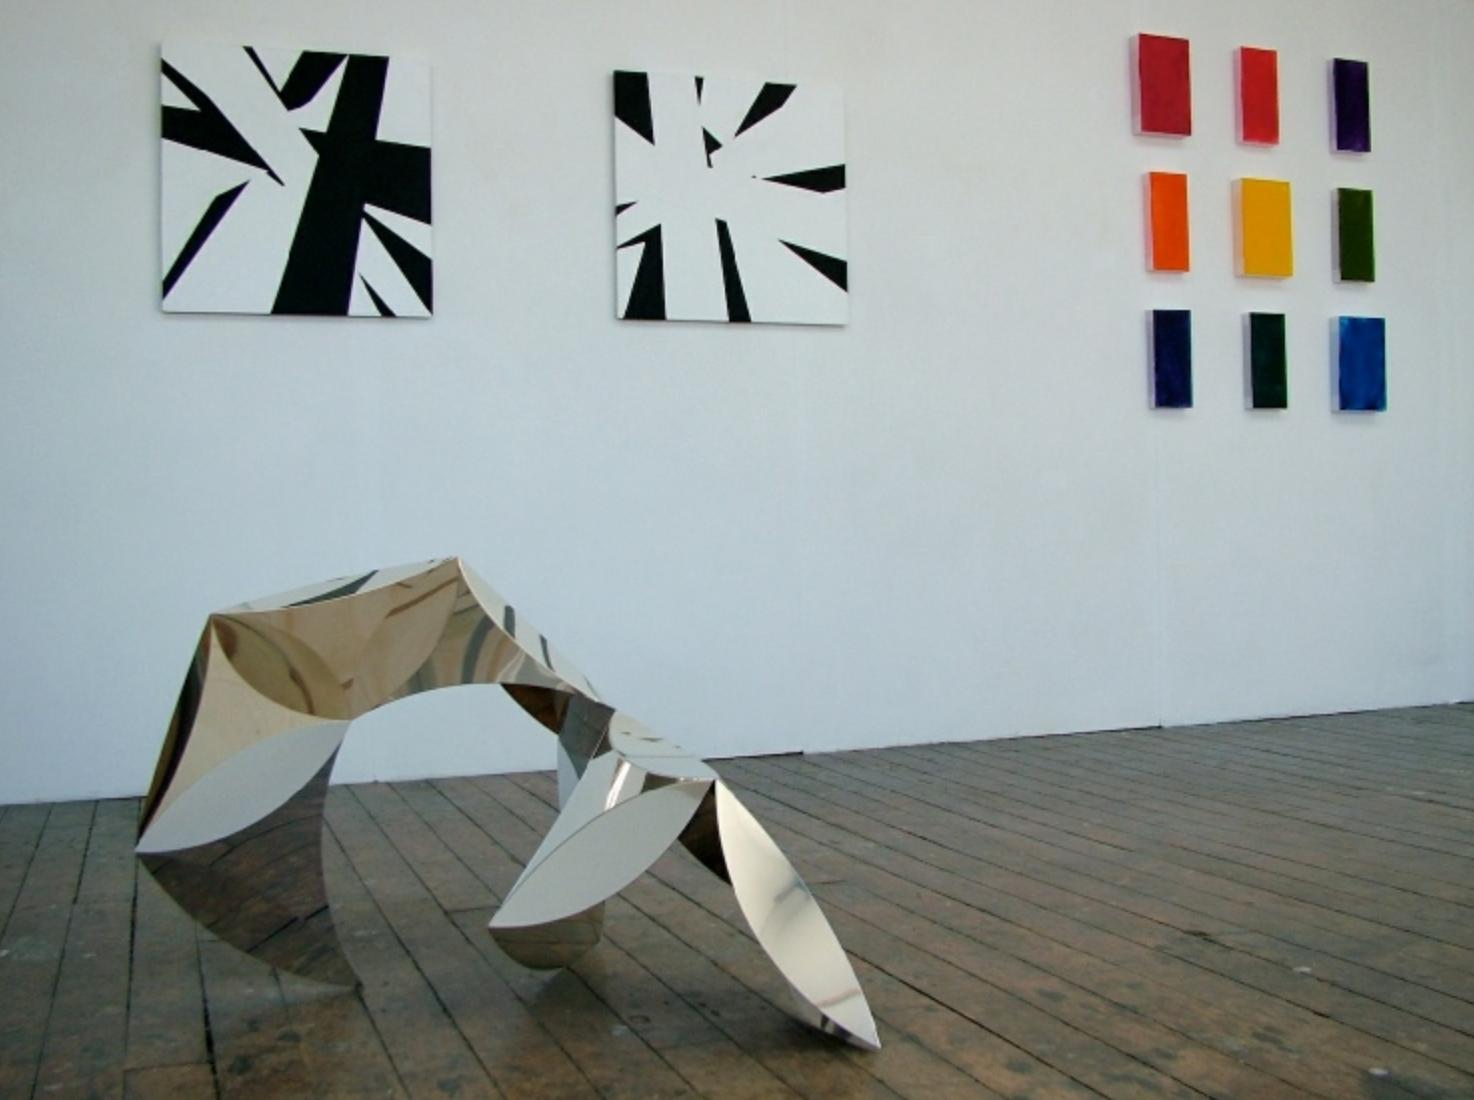 Installation shot, Extended Process 1, Deb Covell, Debra Ramsay, Brigitte Parusel. Photo by Brigitte Parusel